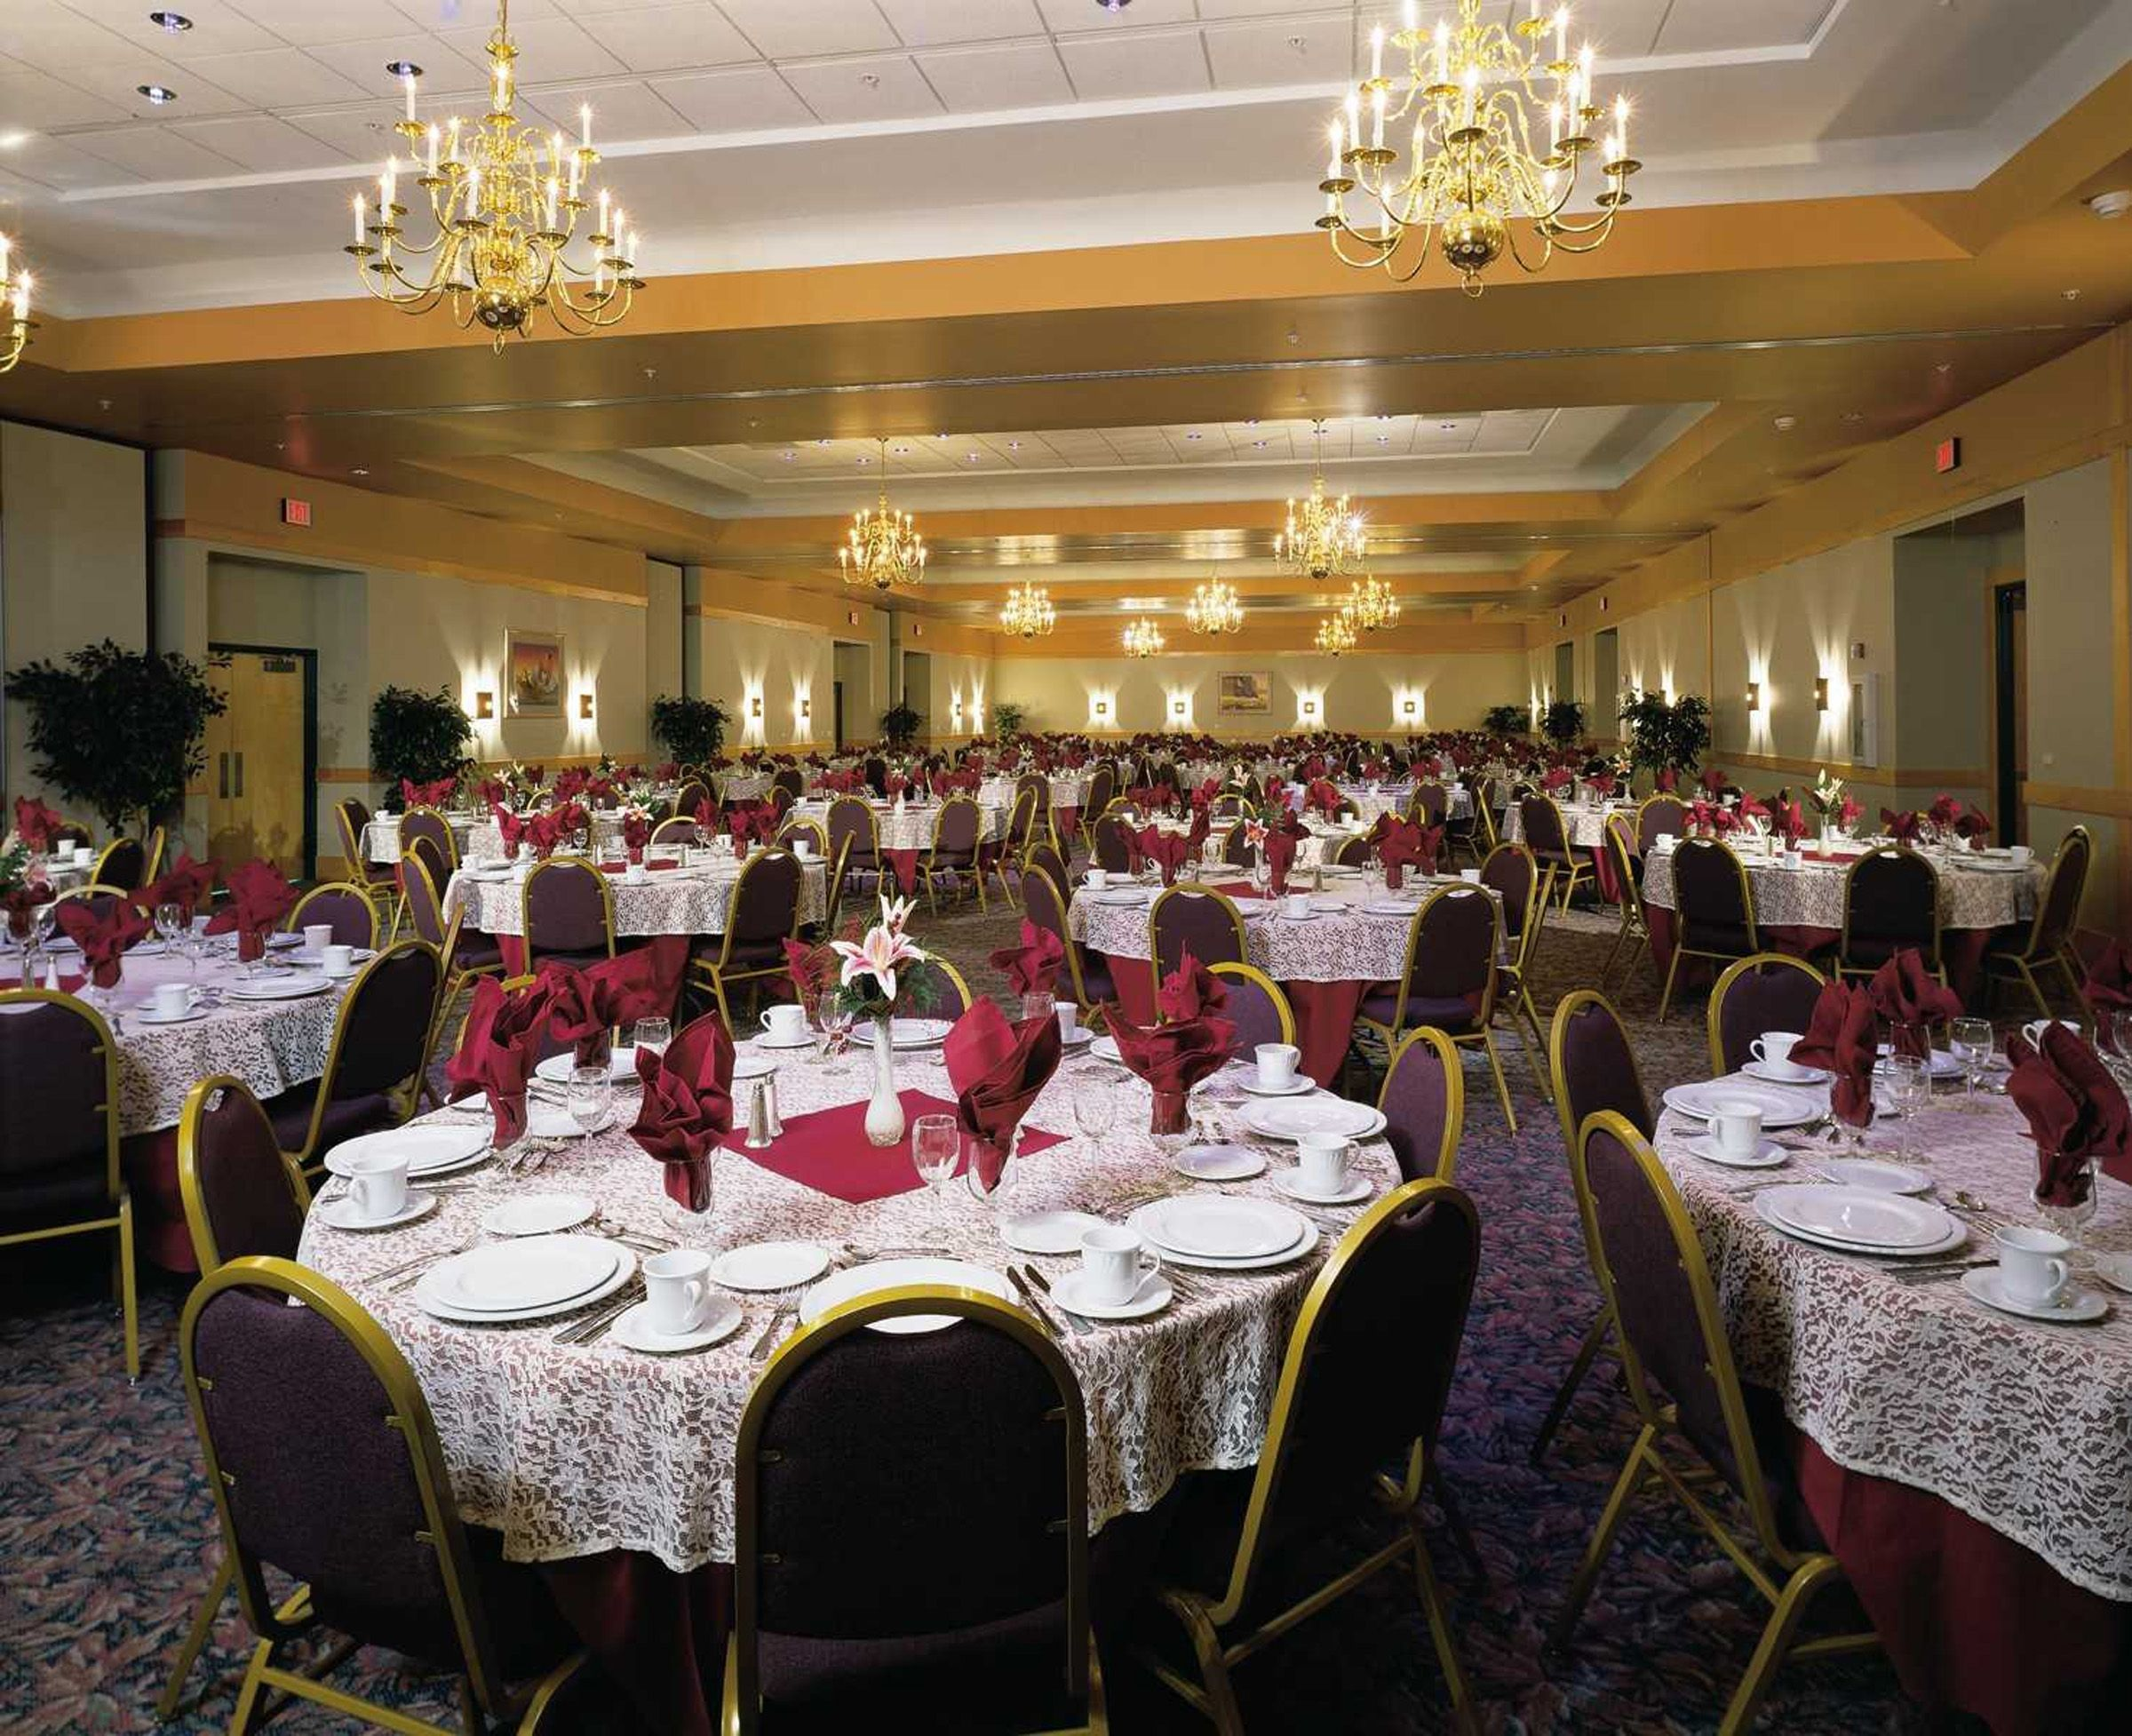 Kewadin Casino Grand Ballroom Perfect Spot For An Unforgettable